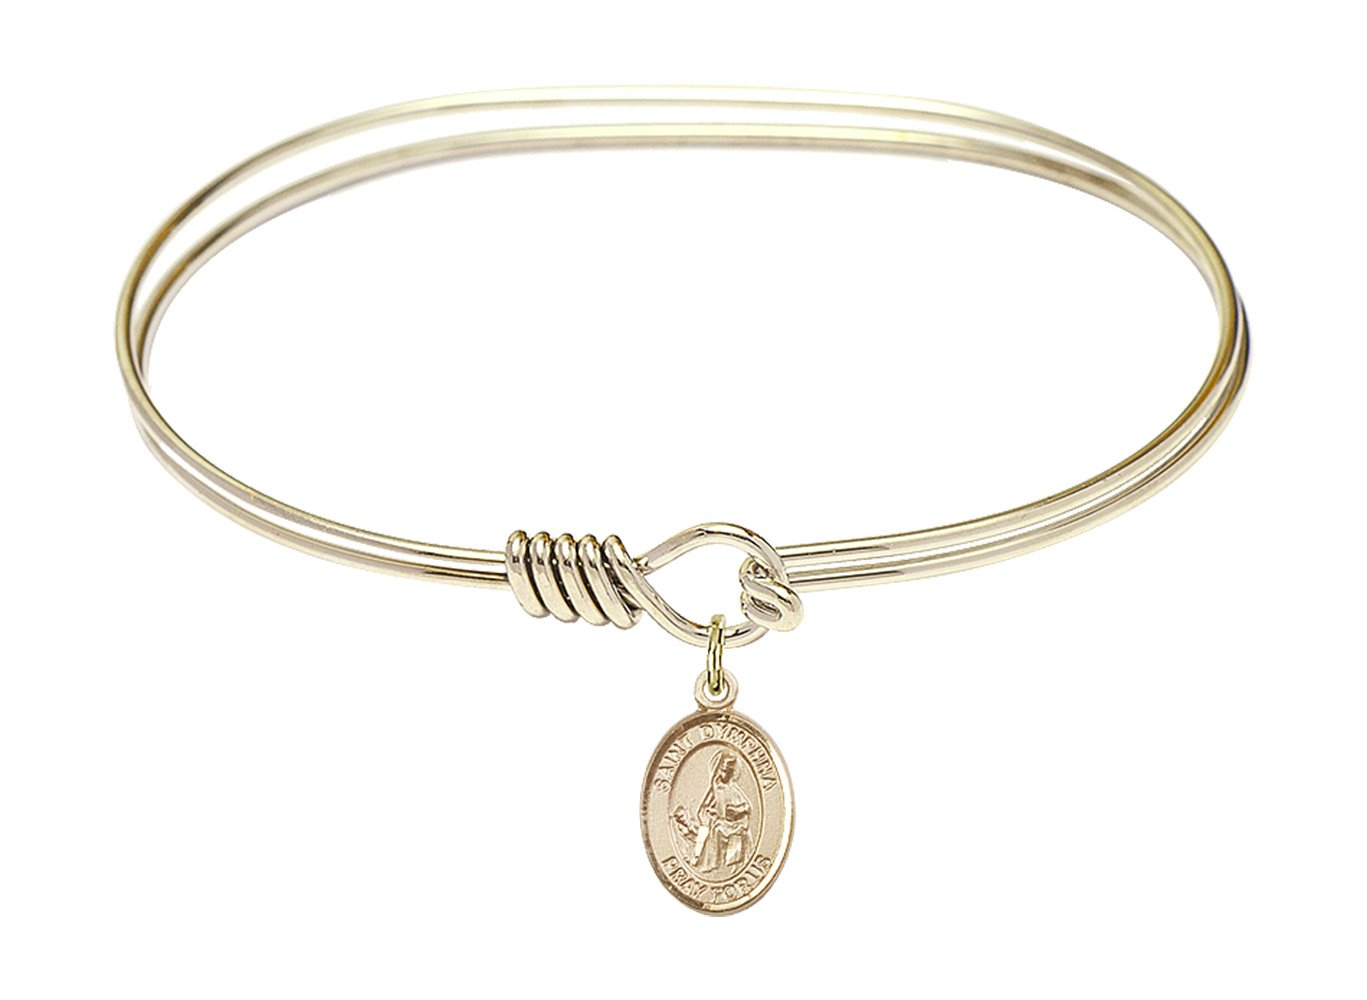 DiamondJewelryNY Eye Hook Bangle Bracelet with a St. Dymphna Charm.